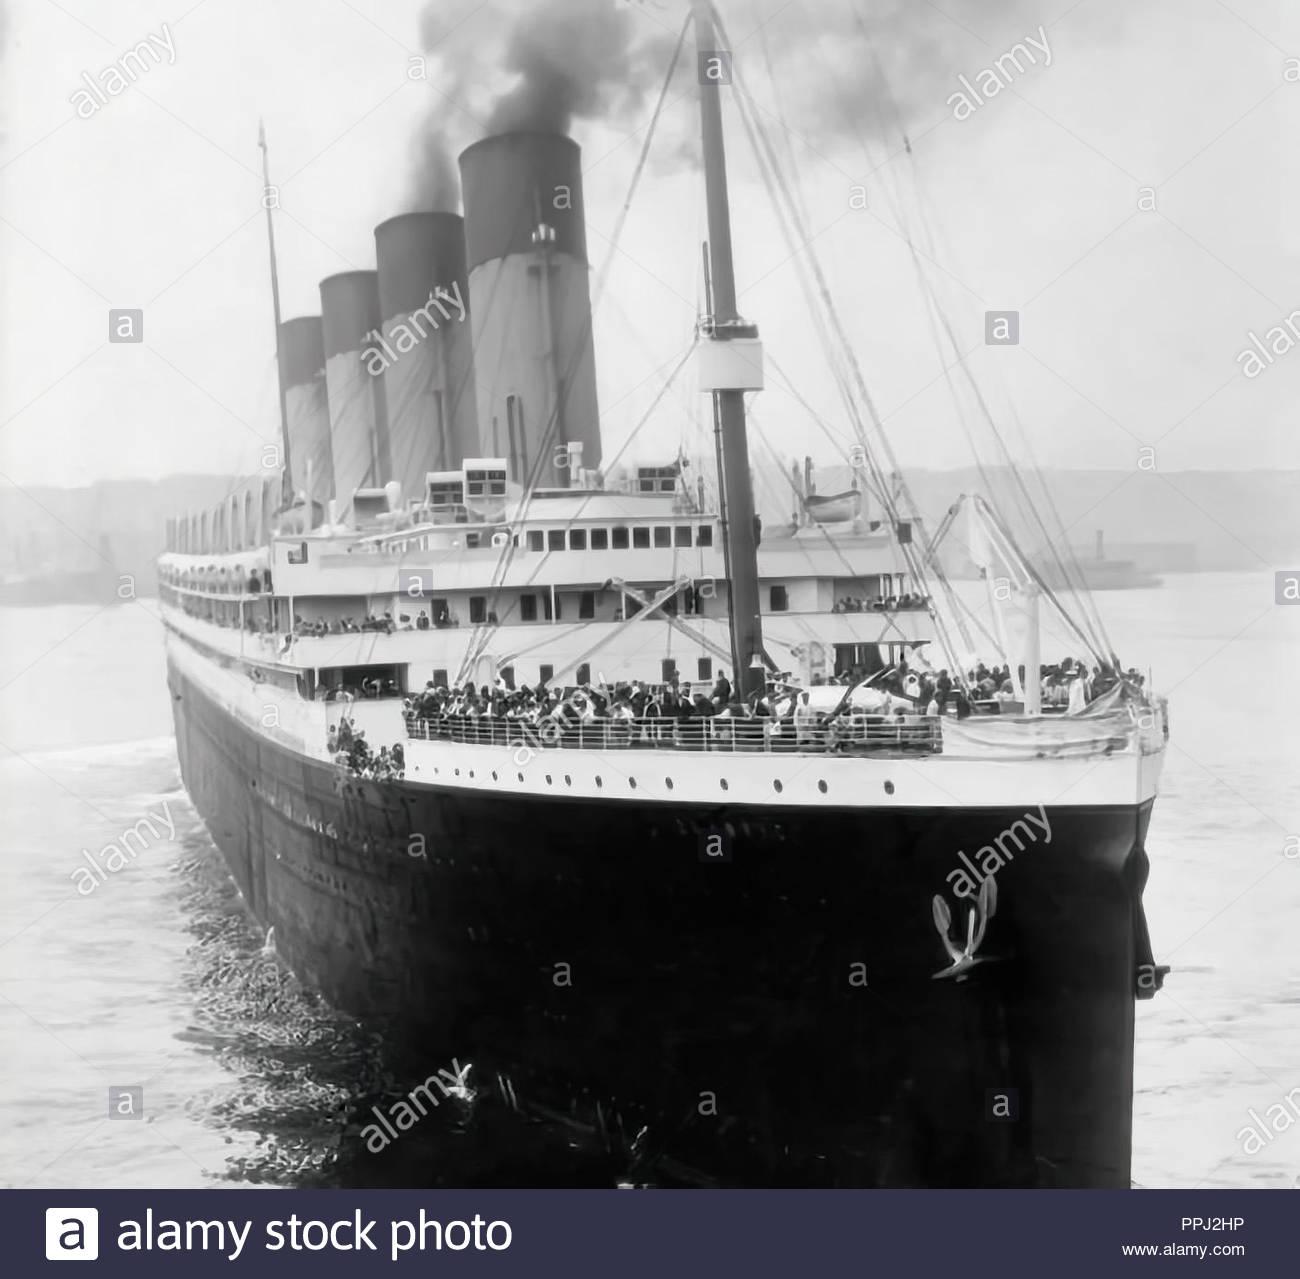 RMS Titanic departing Southampton on April 10, 1912 - Stock Image